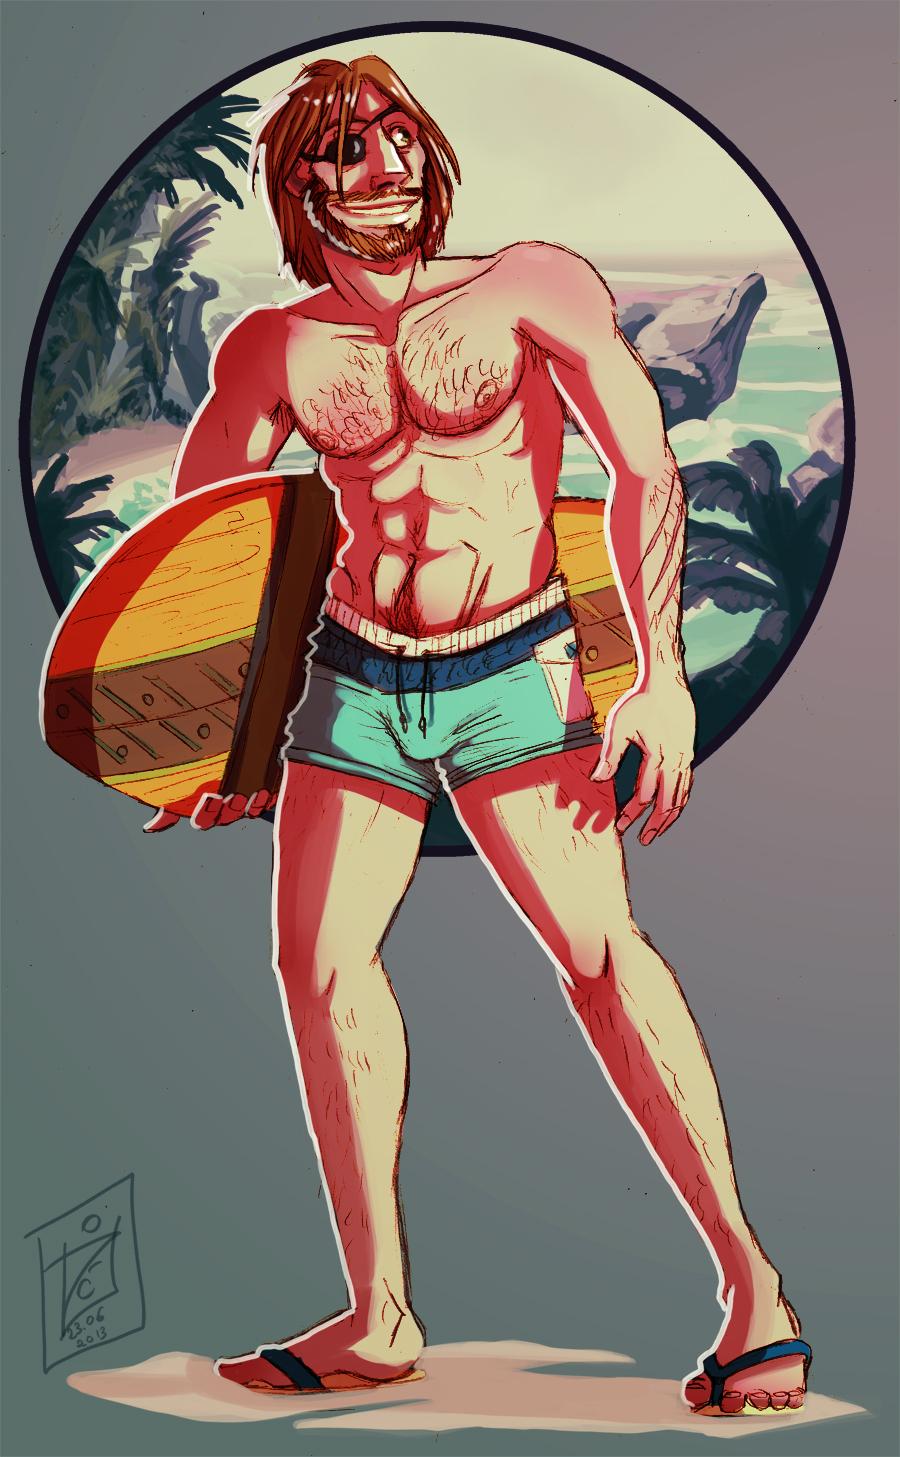 Zraffe - swimsuit commission by iisjah